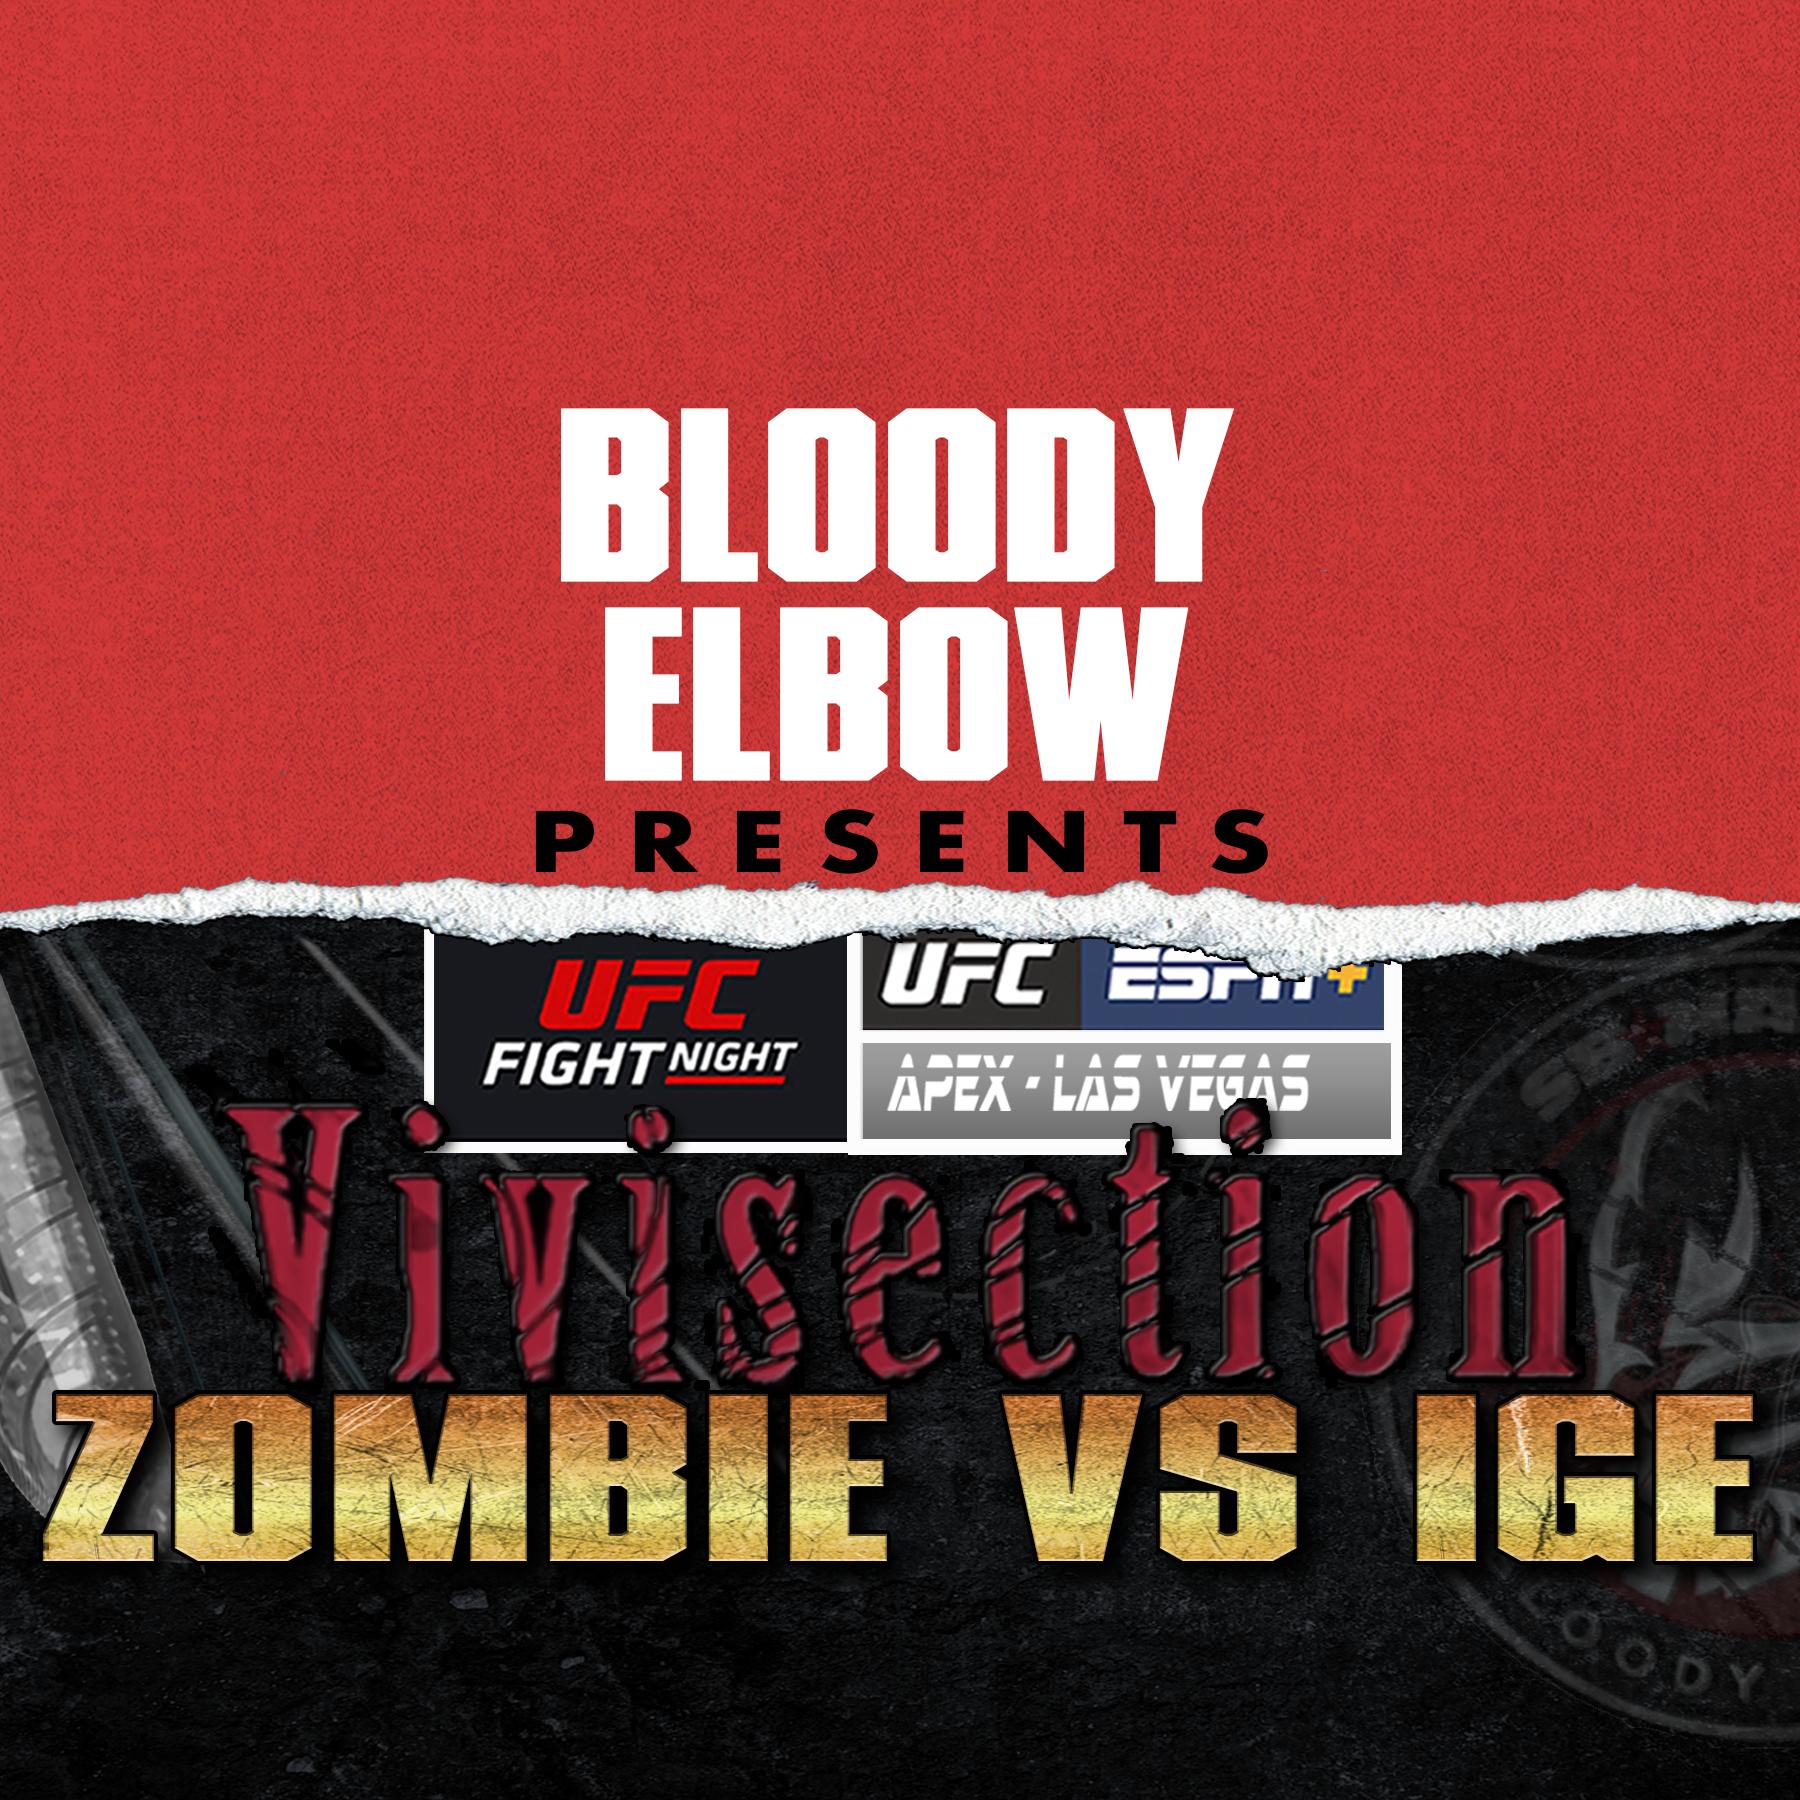 MMA VIVI, The MMA Vivisection, UFC VEGAS 29, Korean Zombie vs Dan Ige, Chan Sung Yung vs Dan Ige, UFC Picks & Predictions, UFC Odds & Analysis, UFC Podcast,